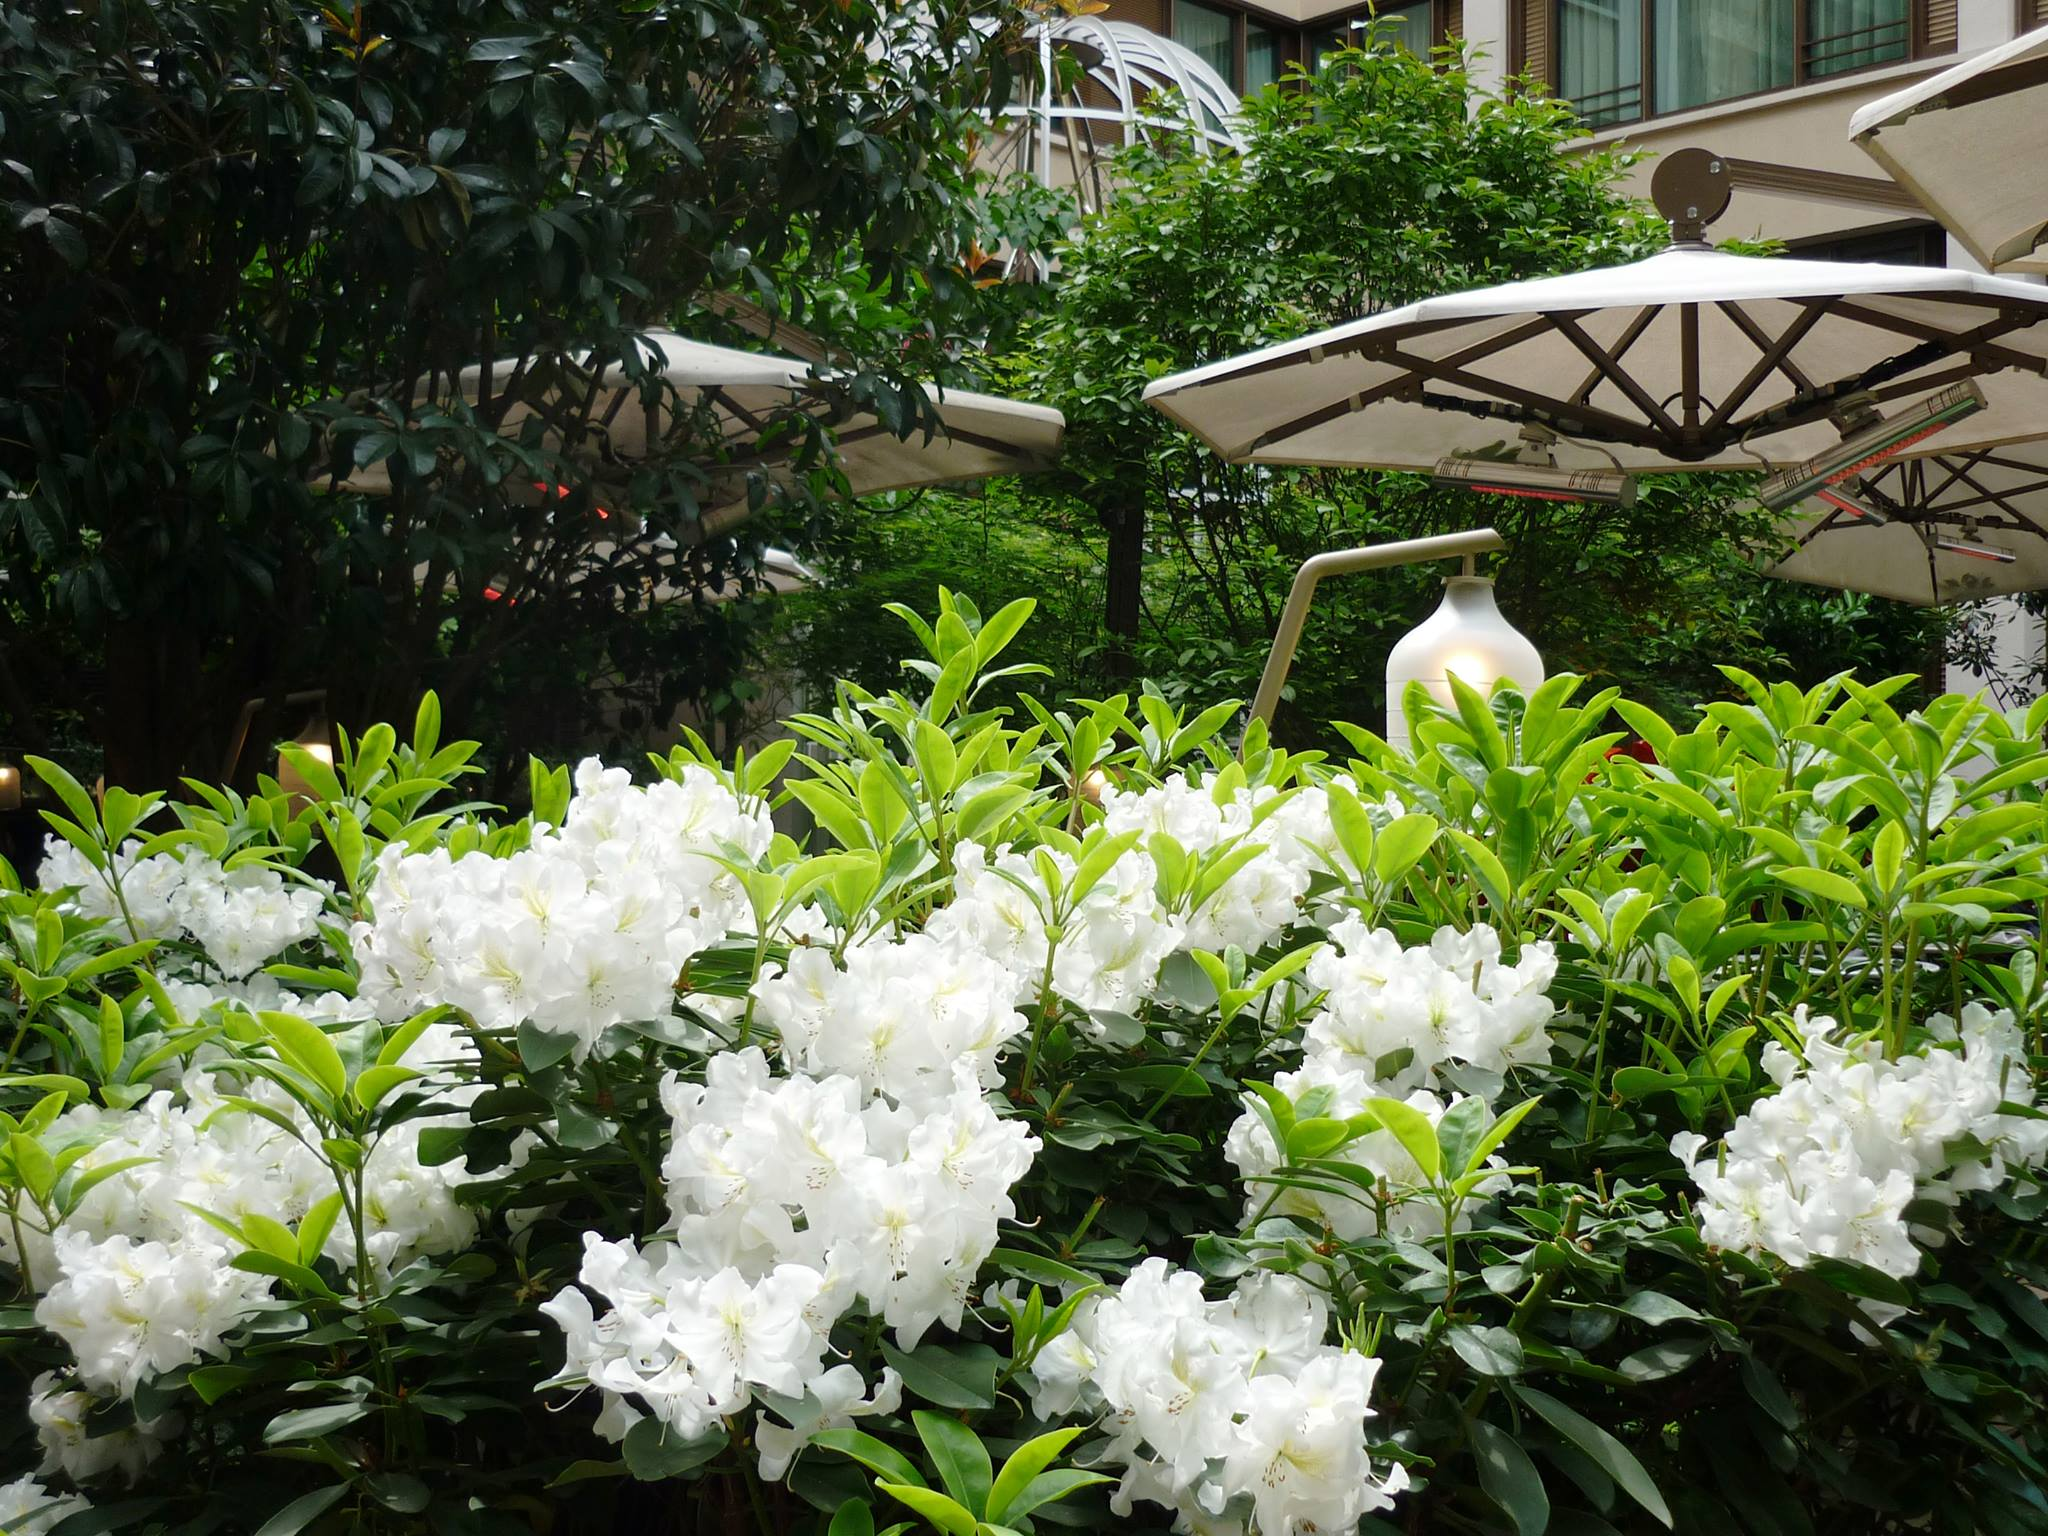 jardin fleuri mandarin oriental paris